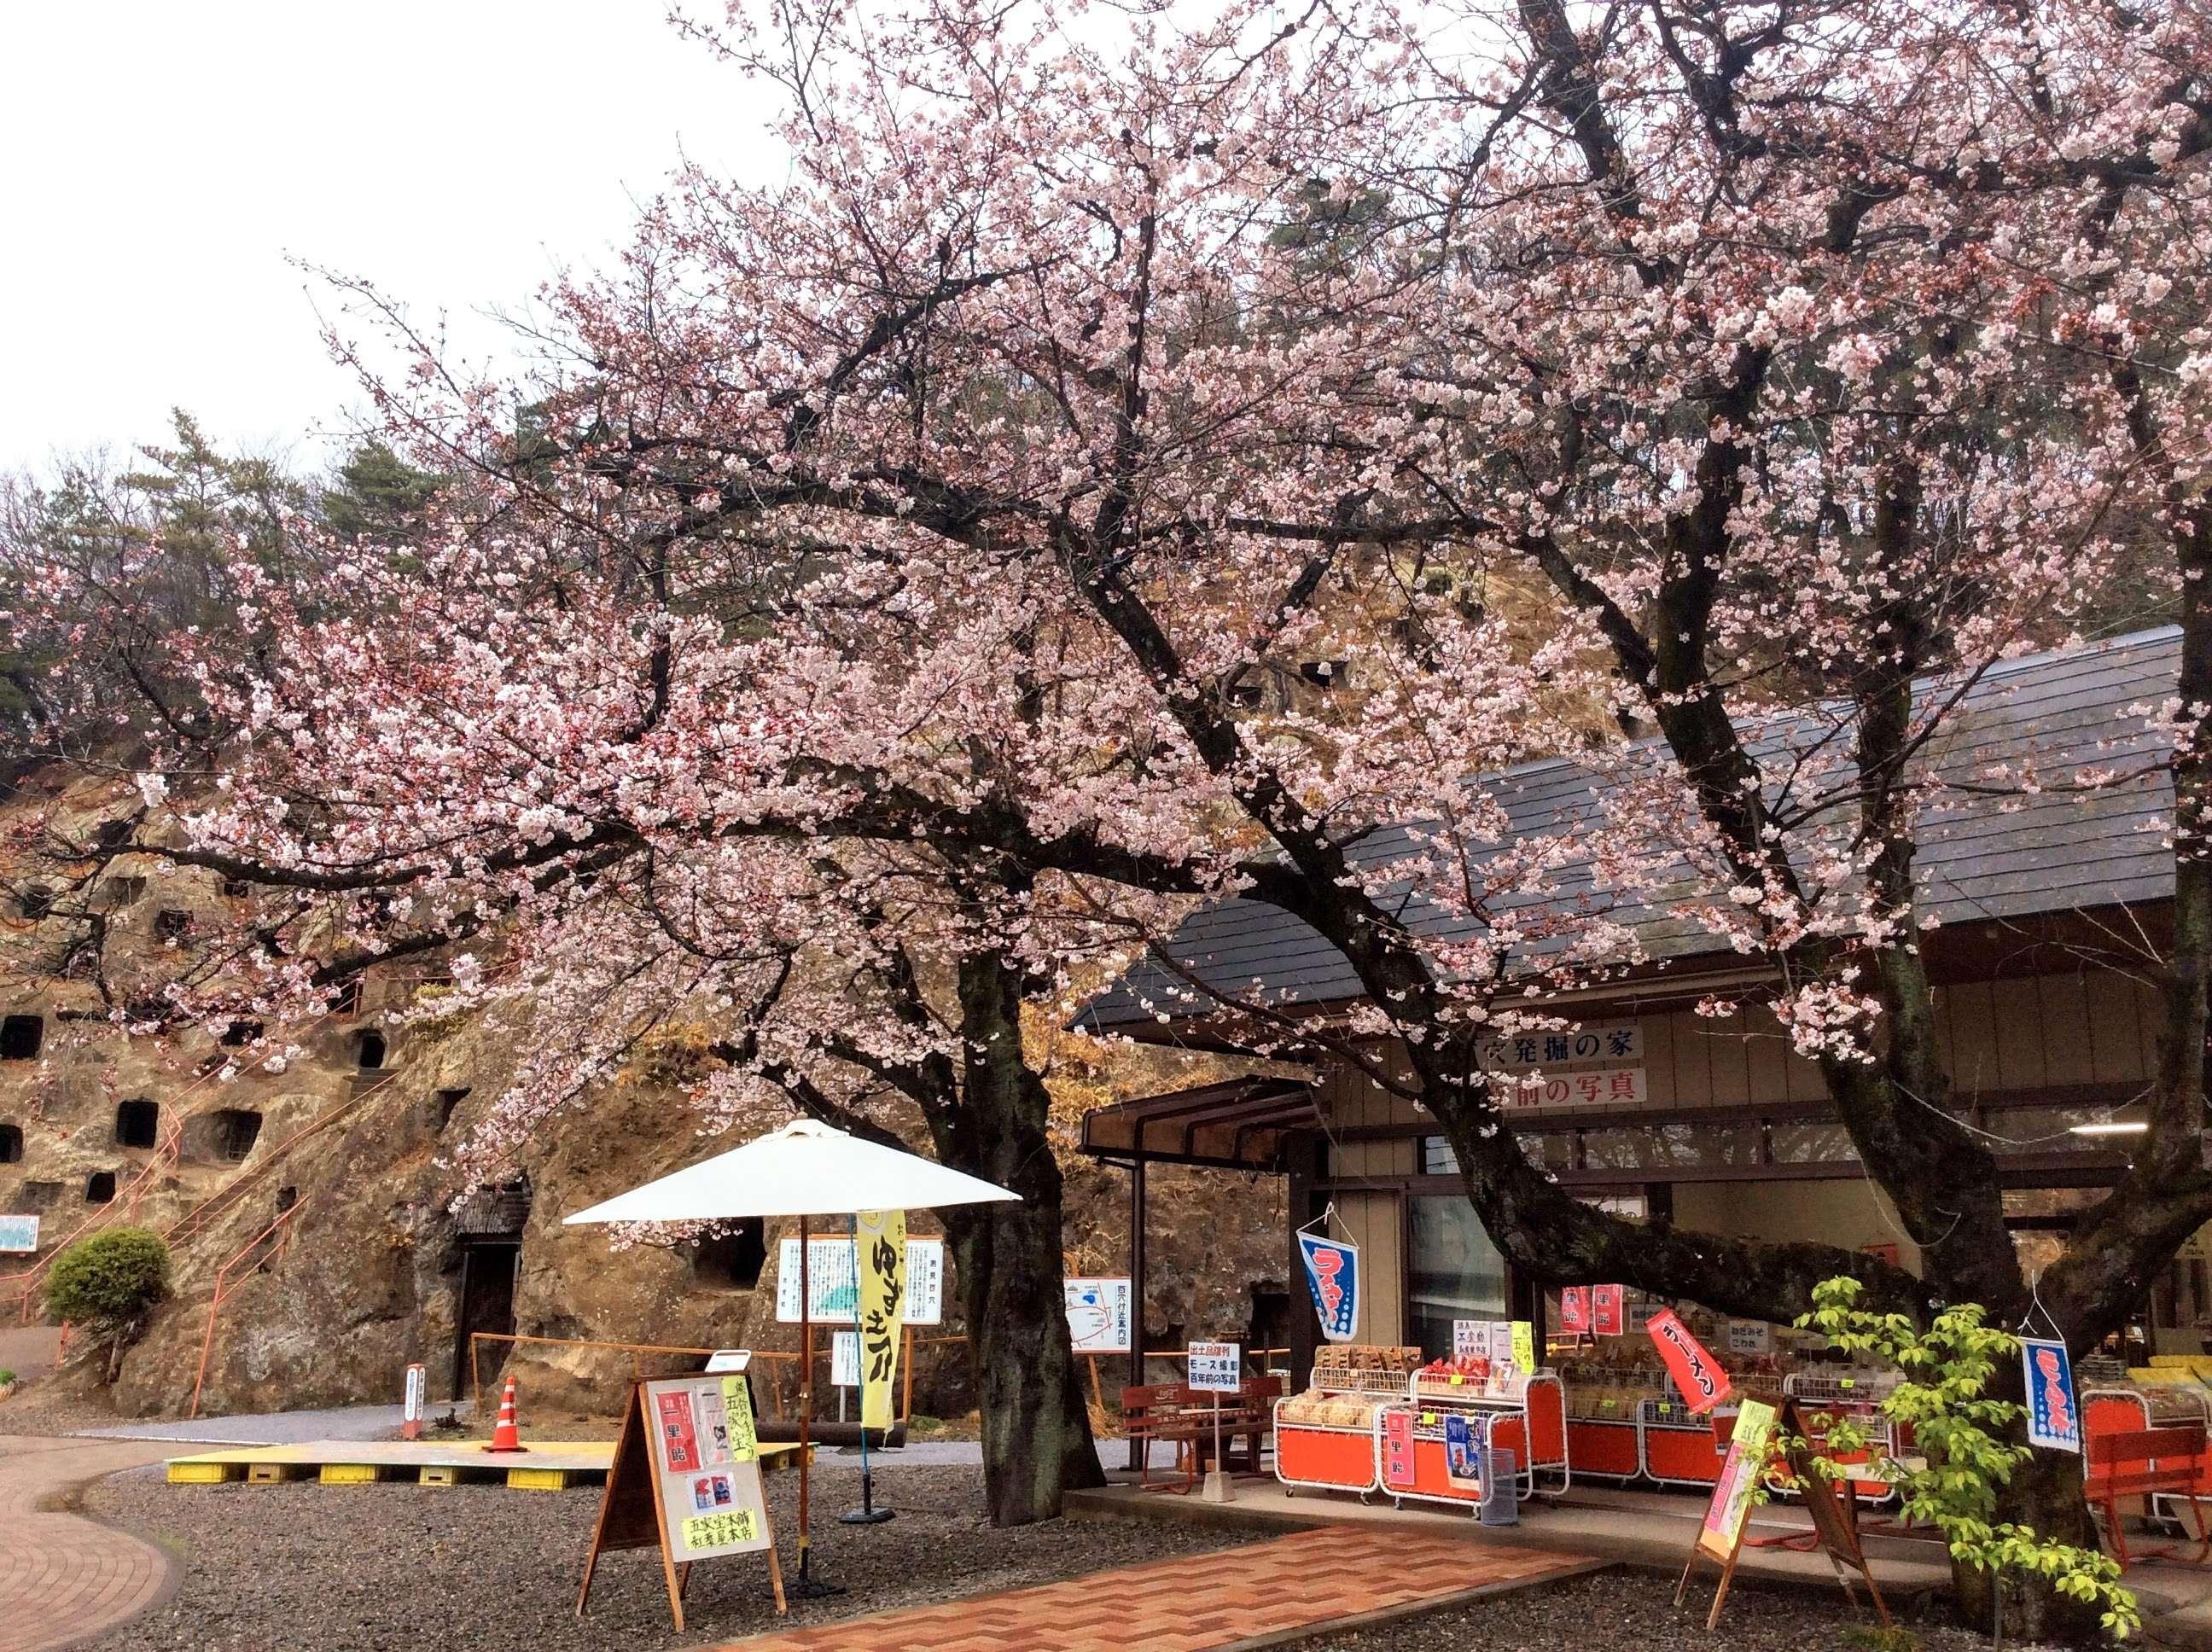 100 caves of yoshimi cherry blossom festival